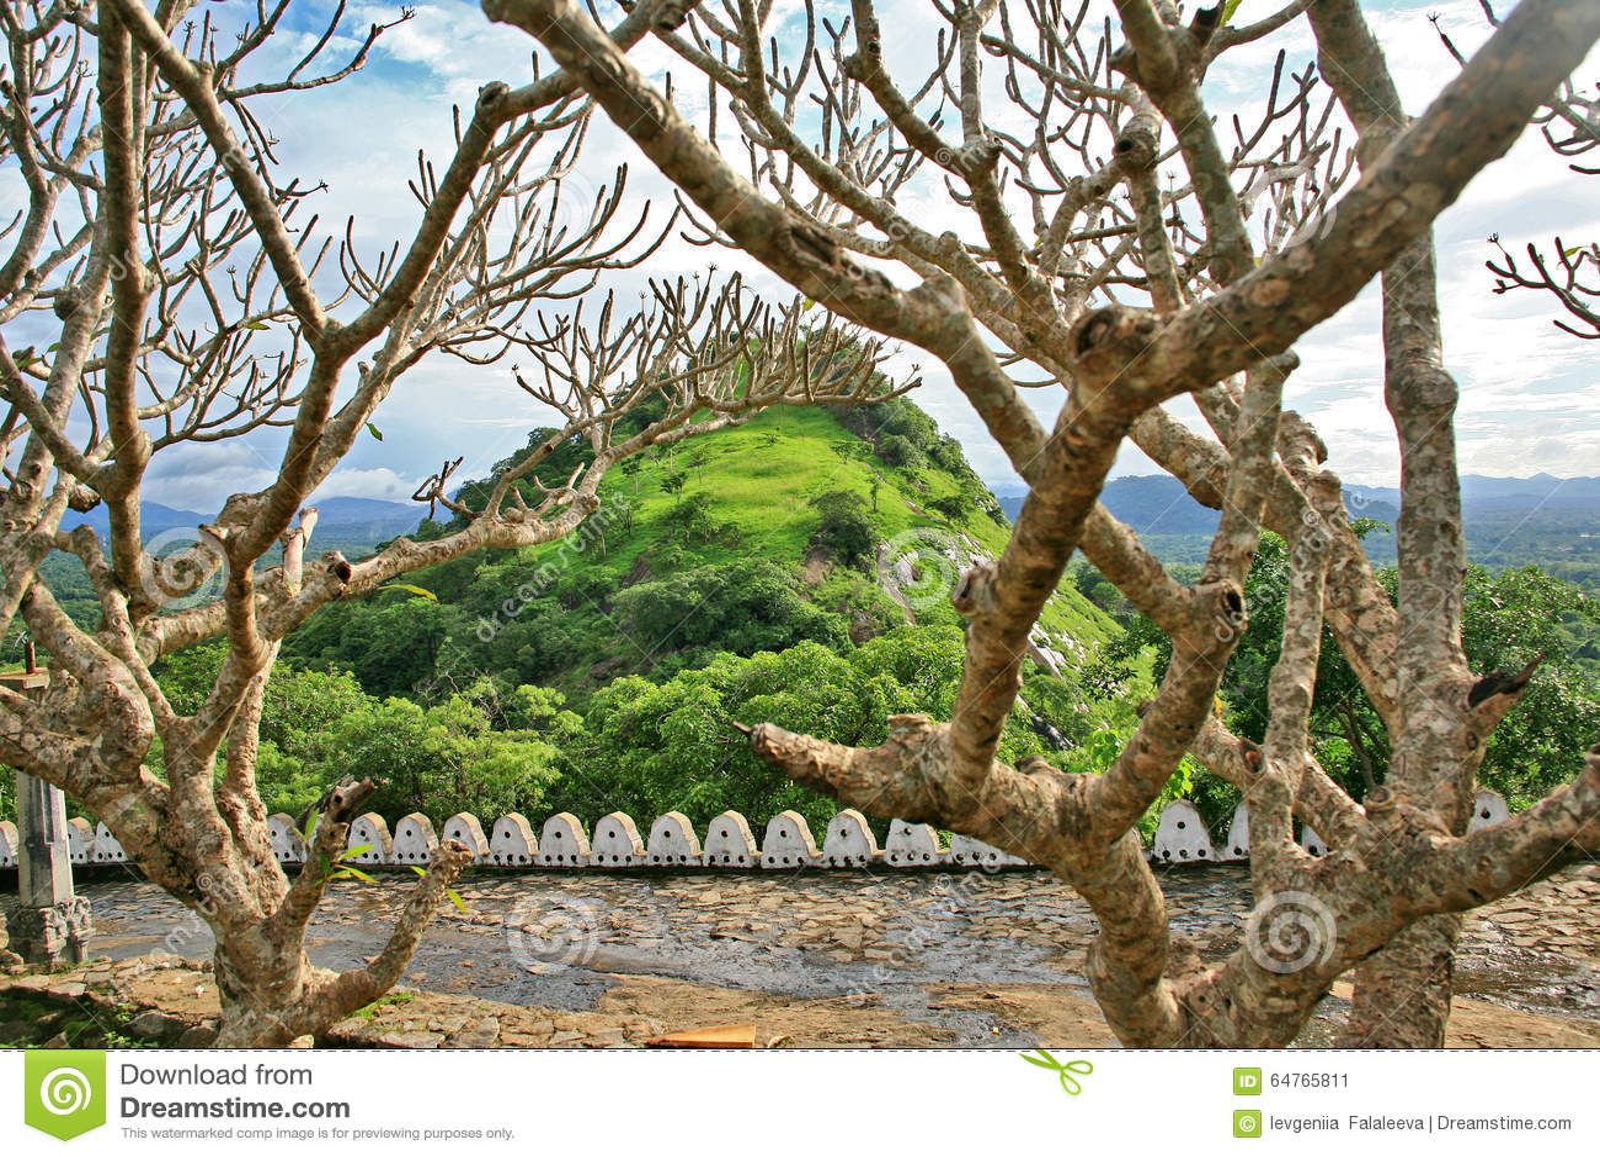 Beautiful trees and plants around Dambulla Temple, Sri Lanka